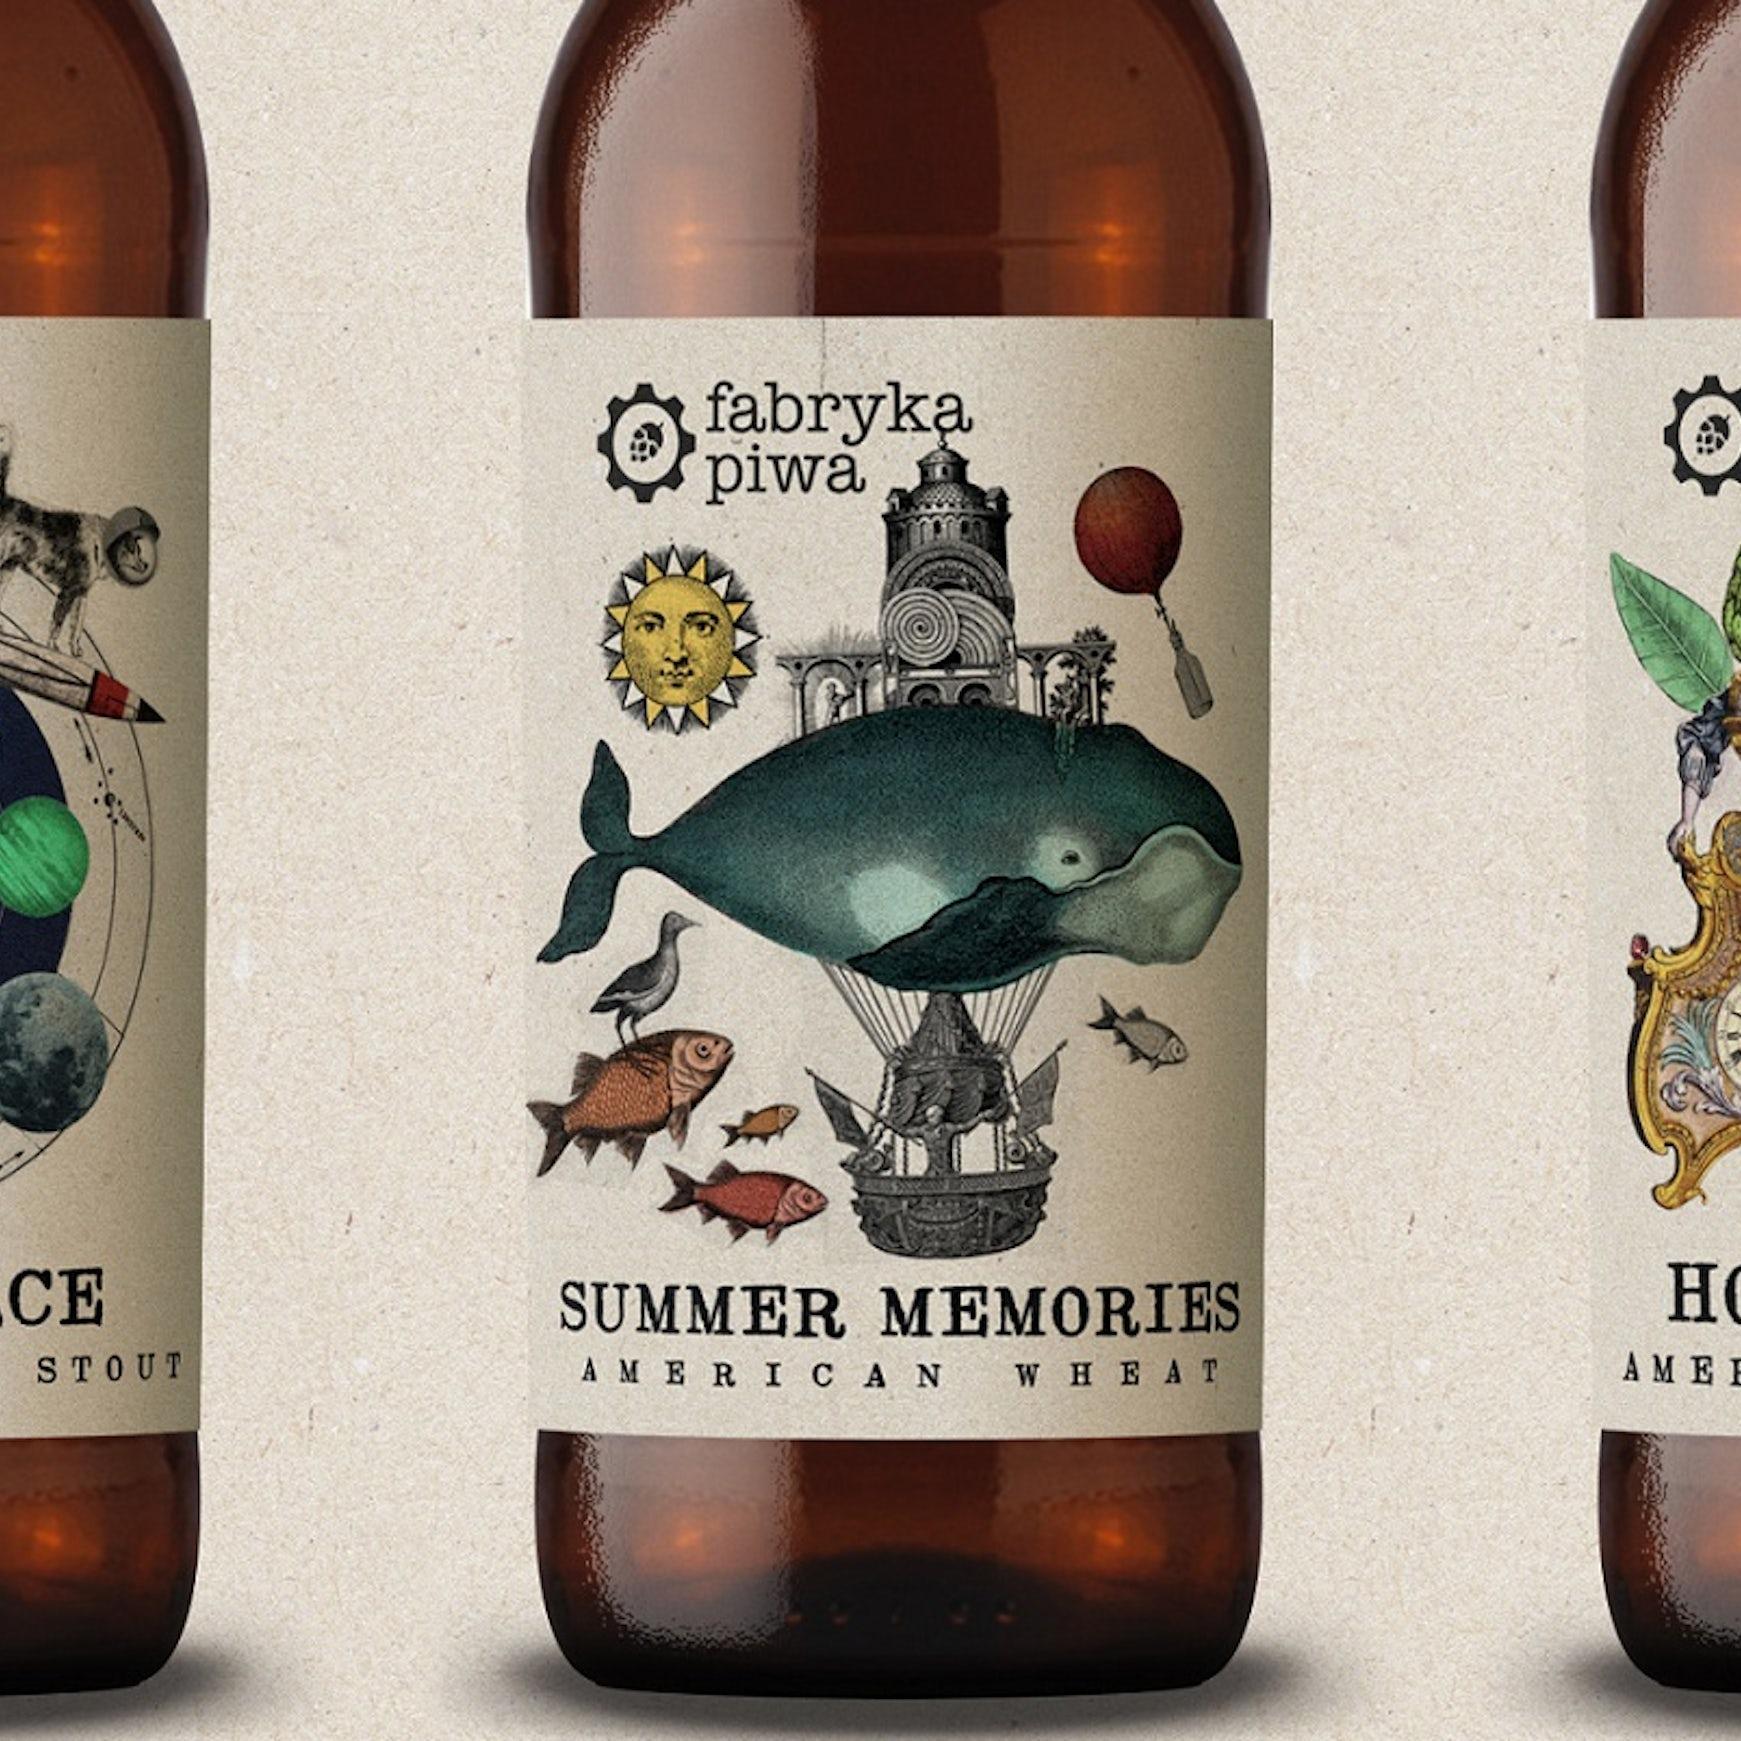 30 Crafty Creative Beer Label Ideas